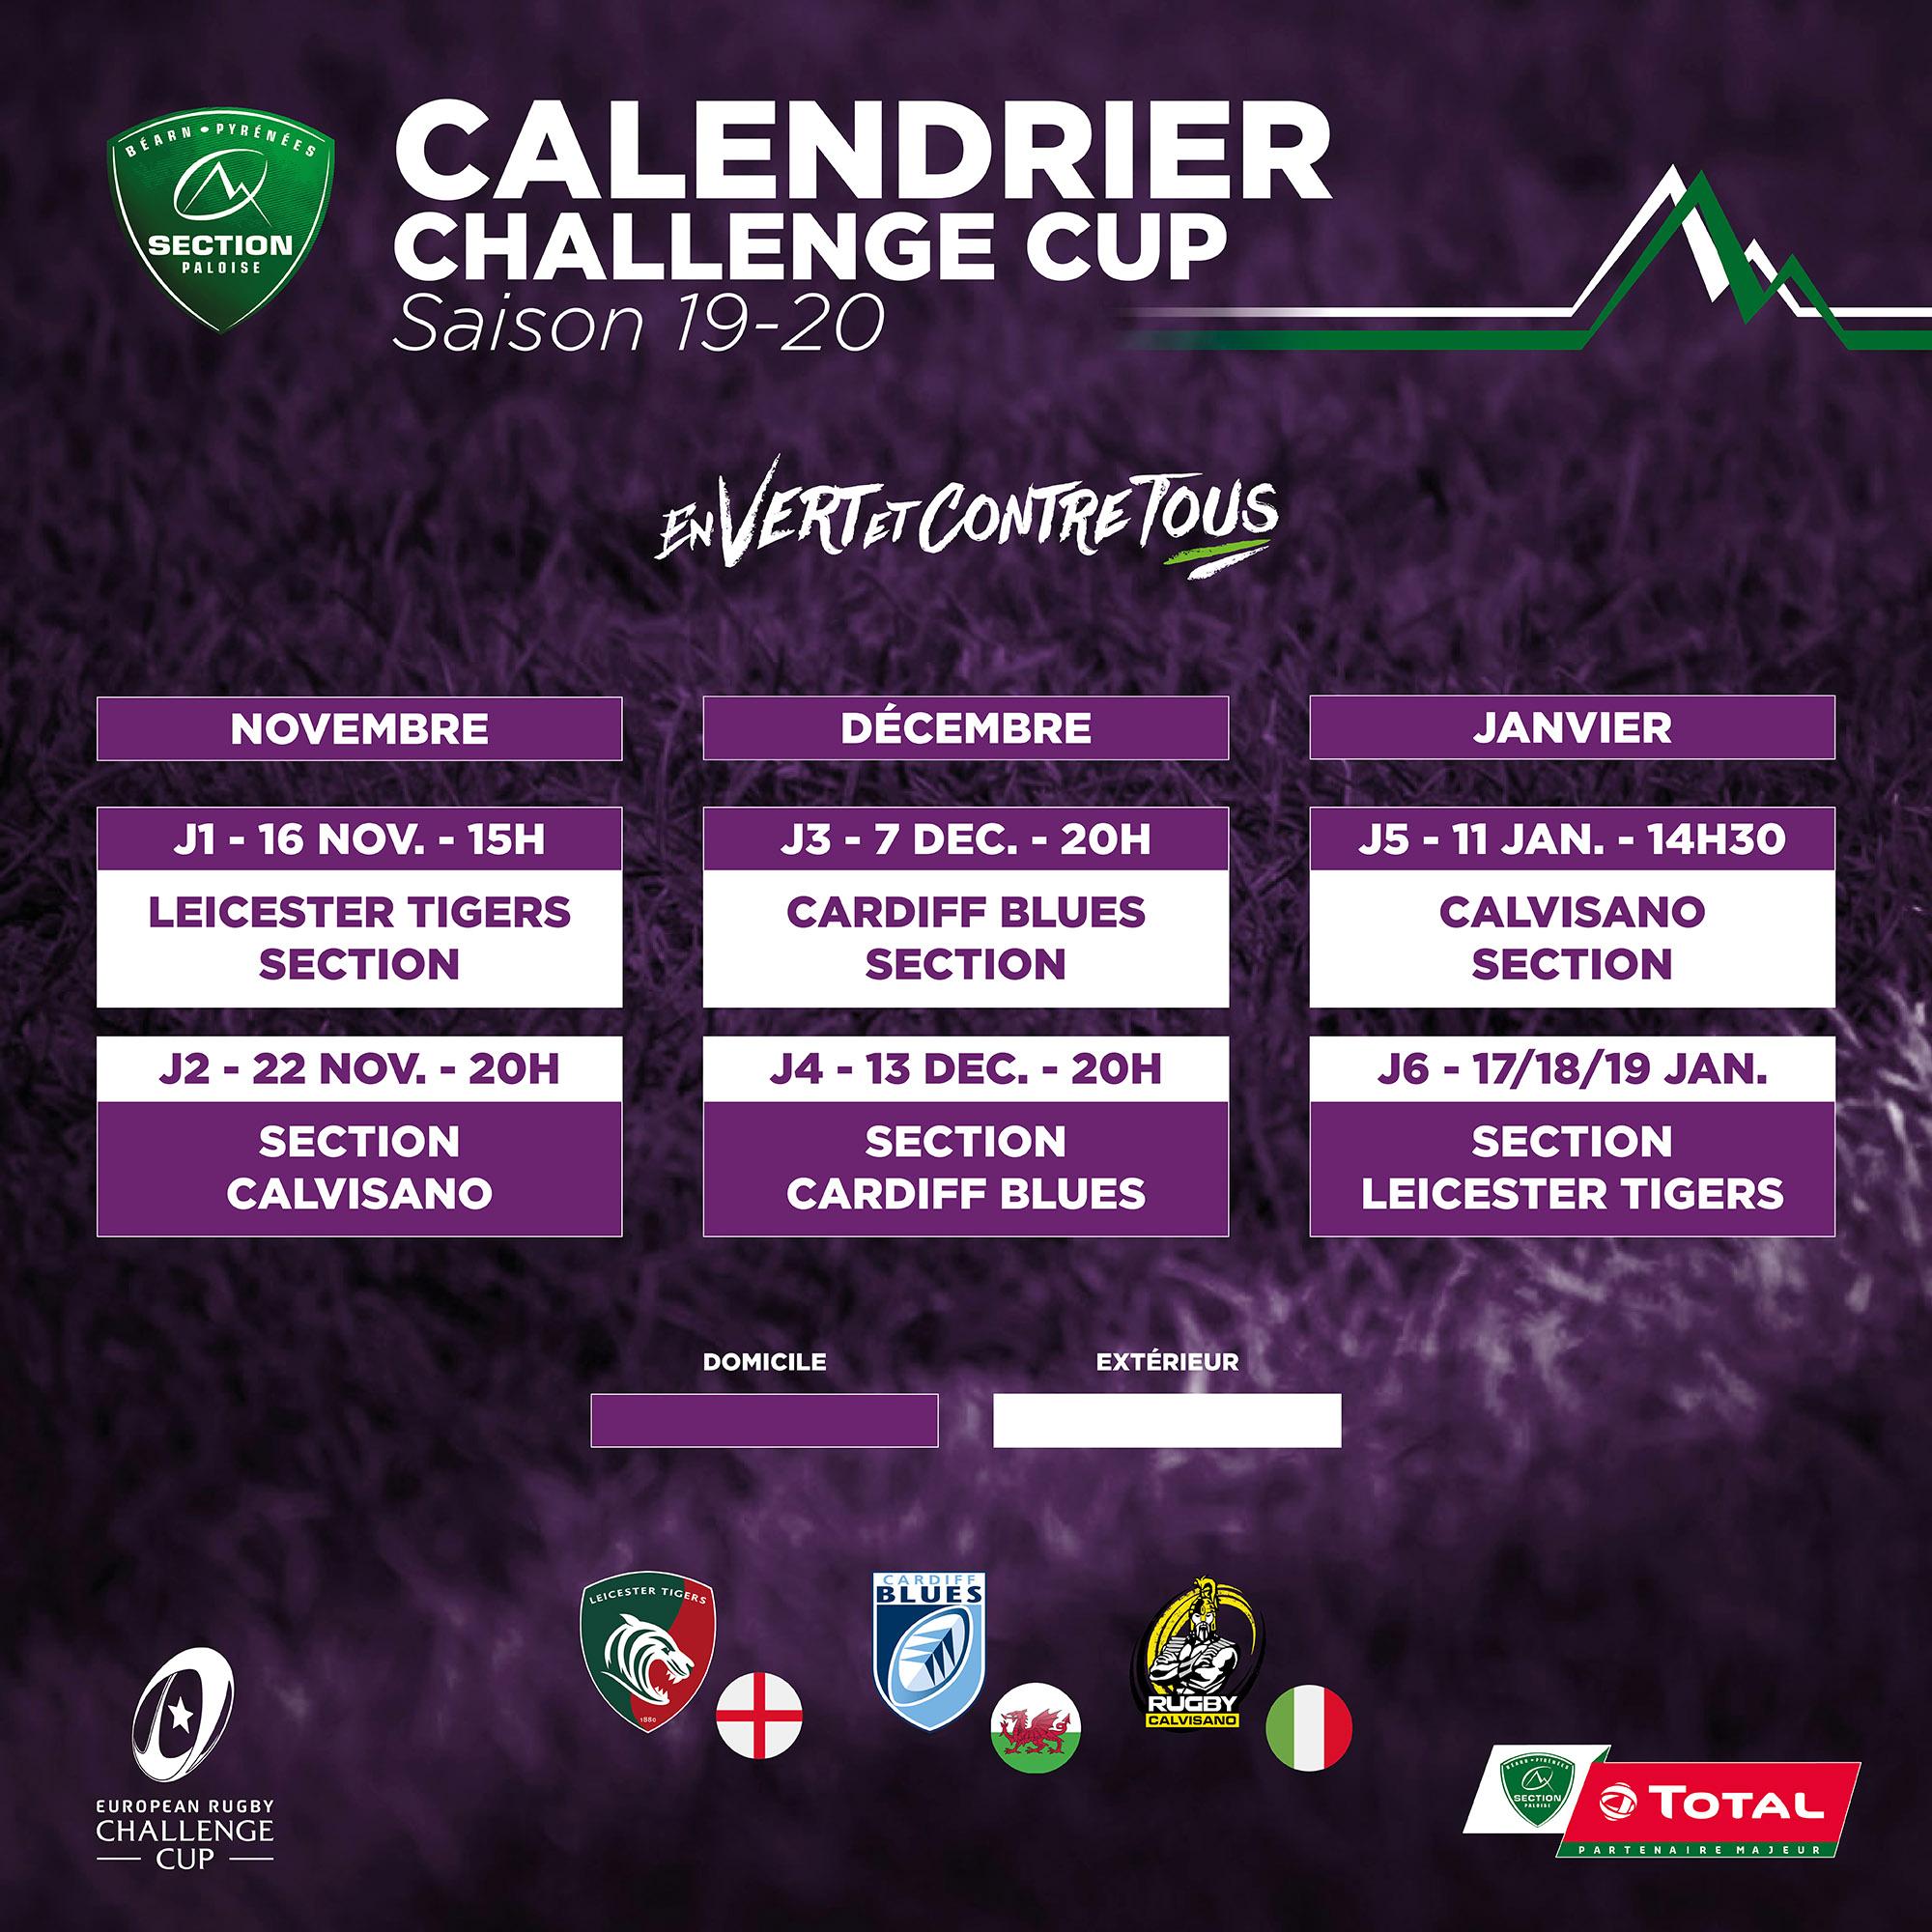 Calendrier Challenge Cup 2021 Challenge cup : le calendrier est connu !